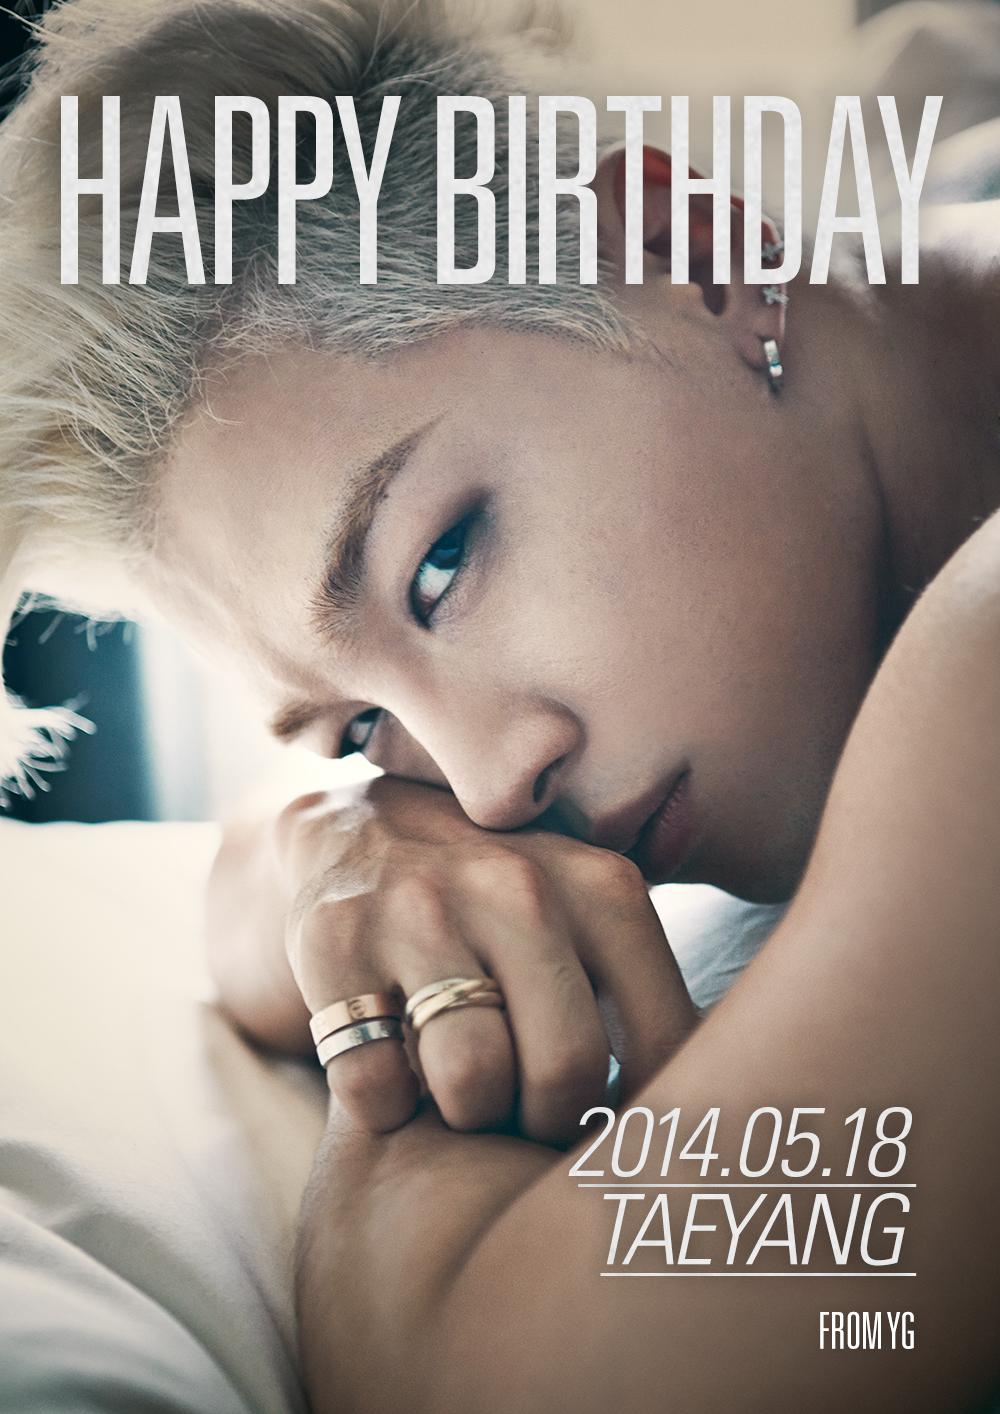 BIGBANG 中的第二個 88 年生的人就是「太陽」,因為更喜歡 2014 年的生日圖,所以私心放上了這張XD